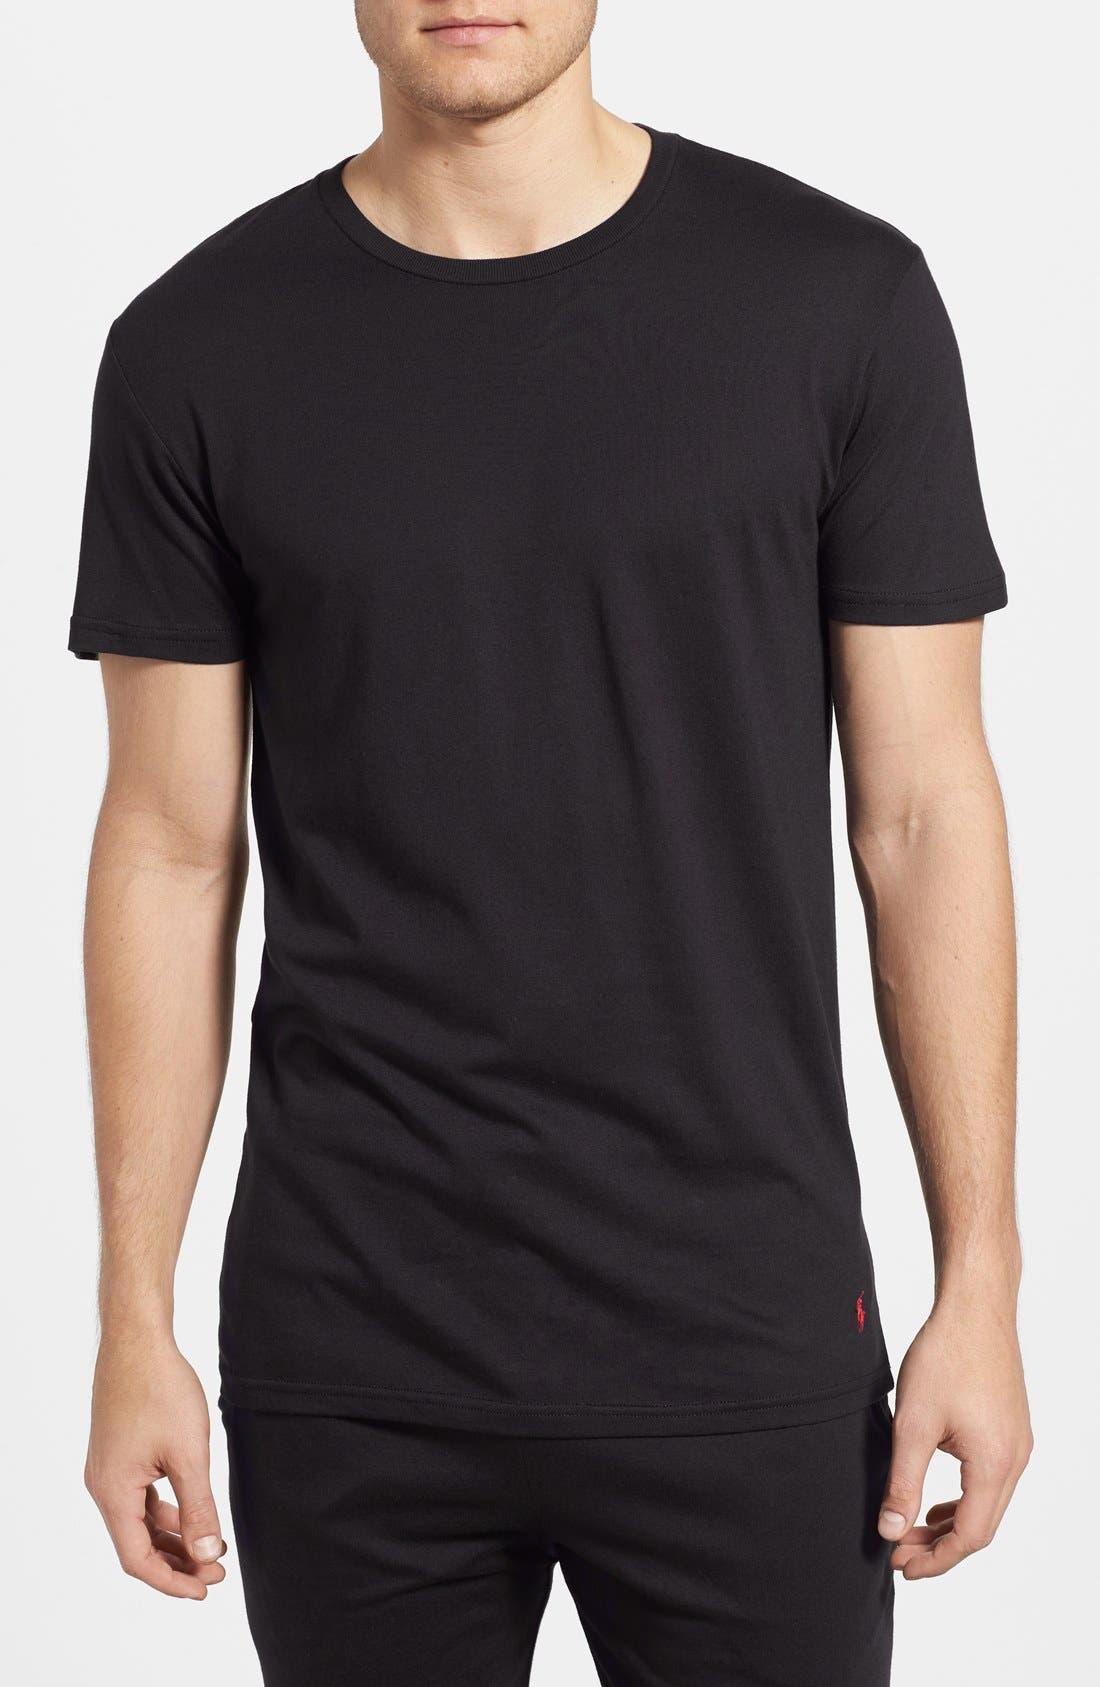 POLO RALPH LAUREN,                             Crewneck T-Shirt,                             Main thumbnail 1, color,                             POLO BLACK